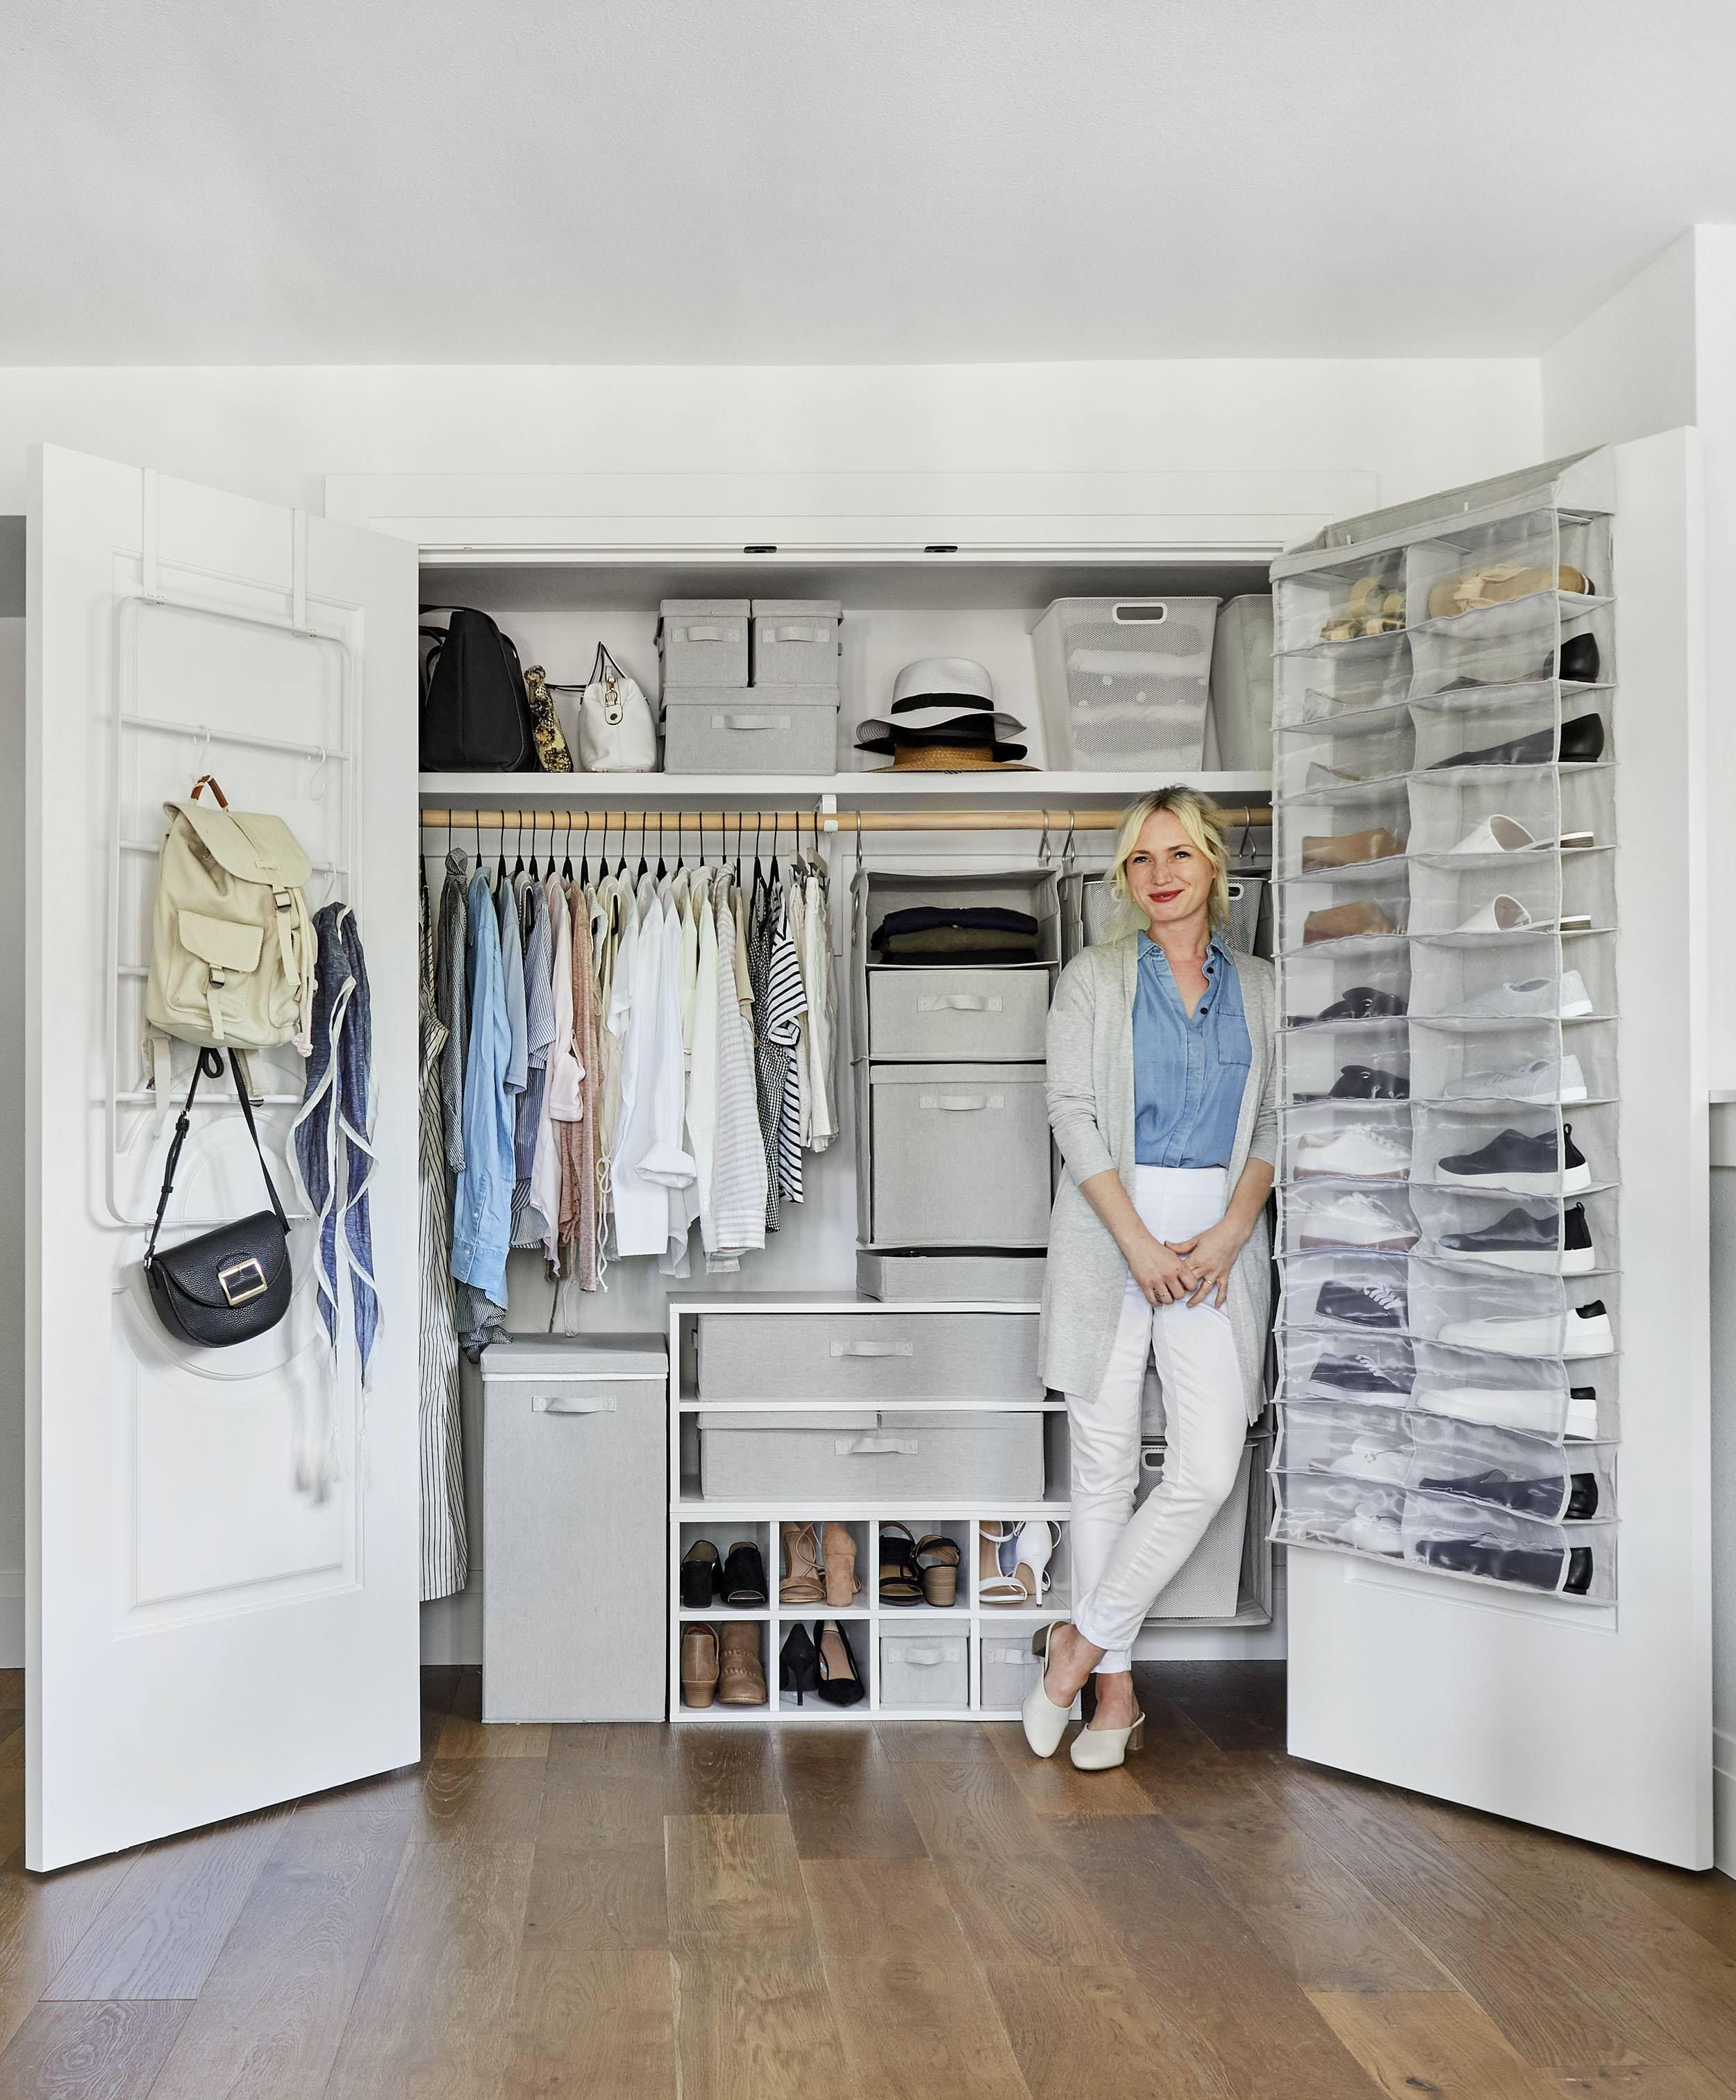 Genius Closet Organizing Ideas From Target S New Made By Design Line Made By Design Closet Bedroom Closet Organization